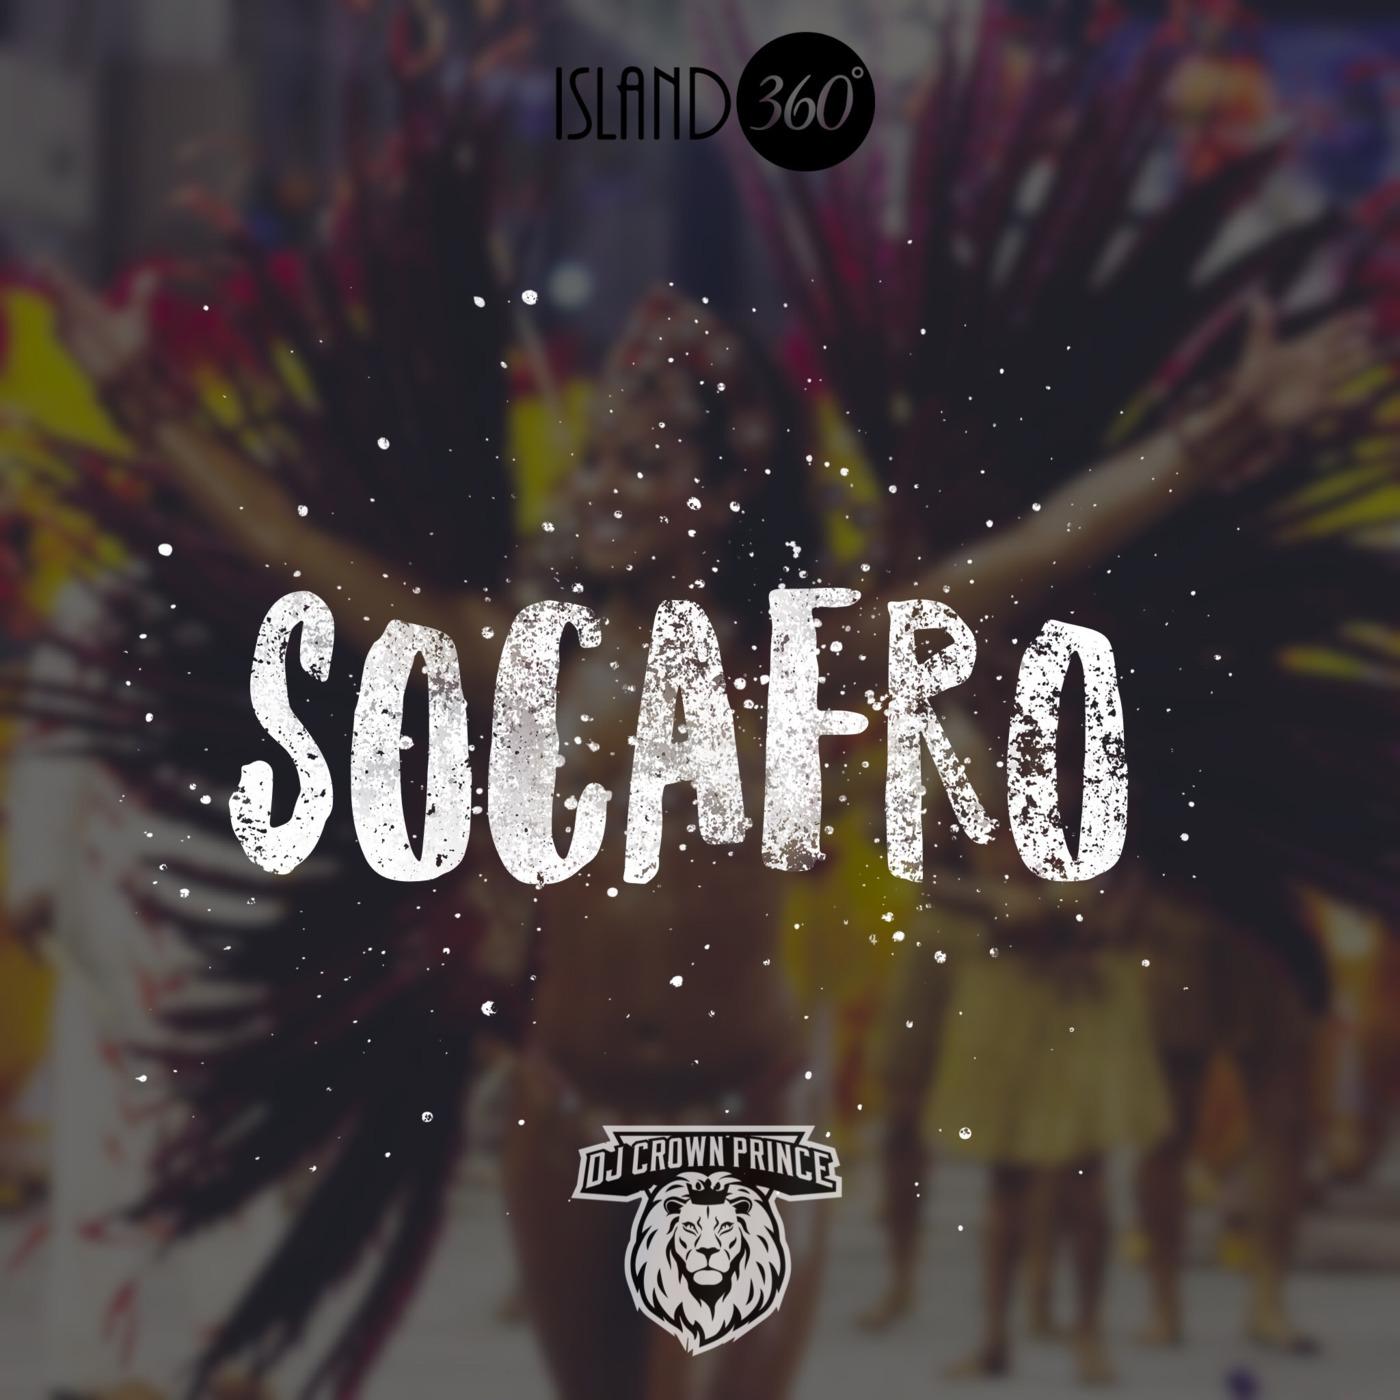 SOCAFRO 3 Dj Crown Prince podcast